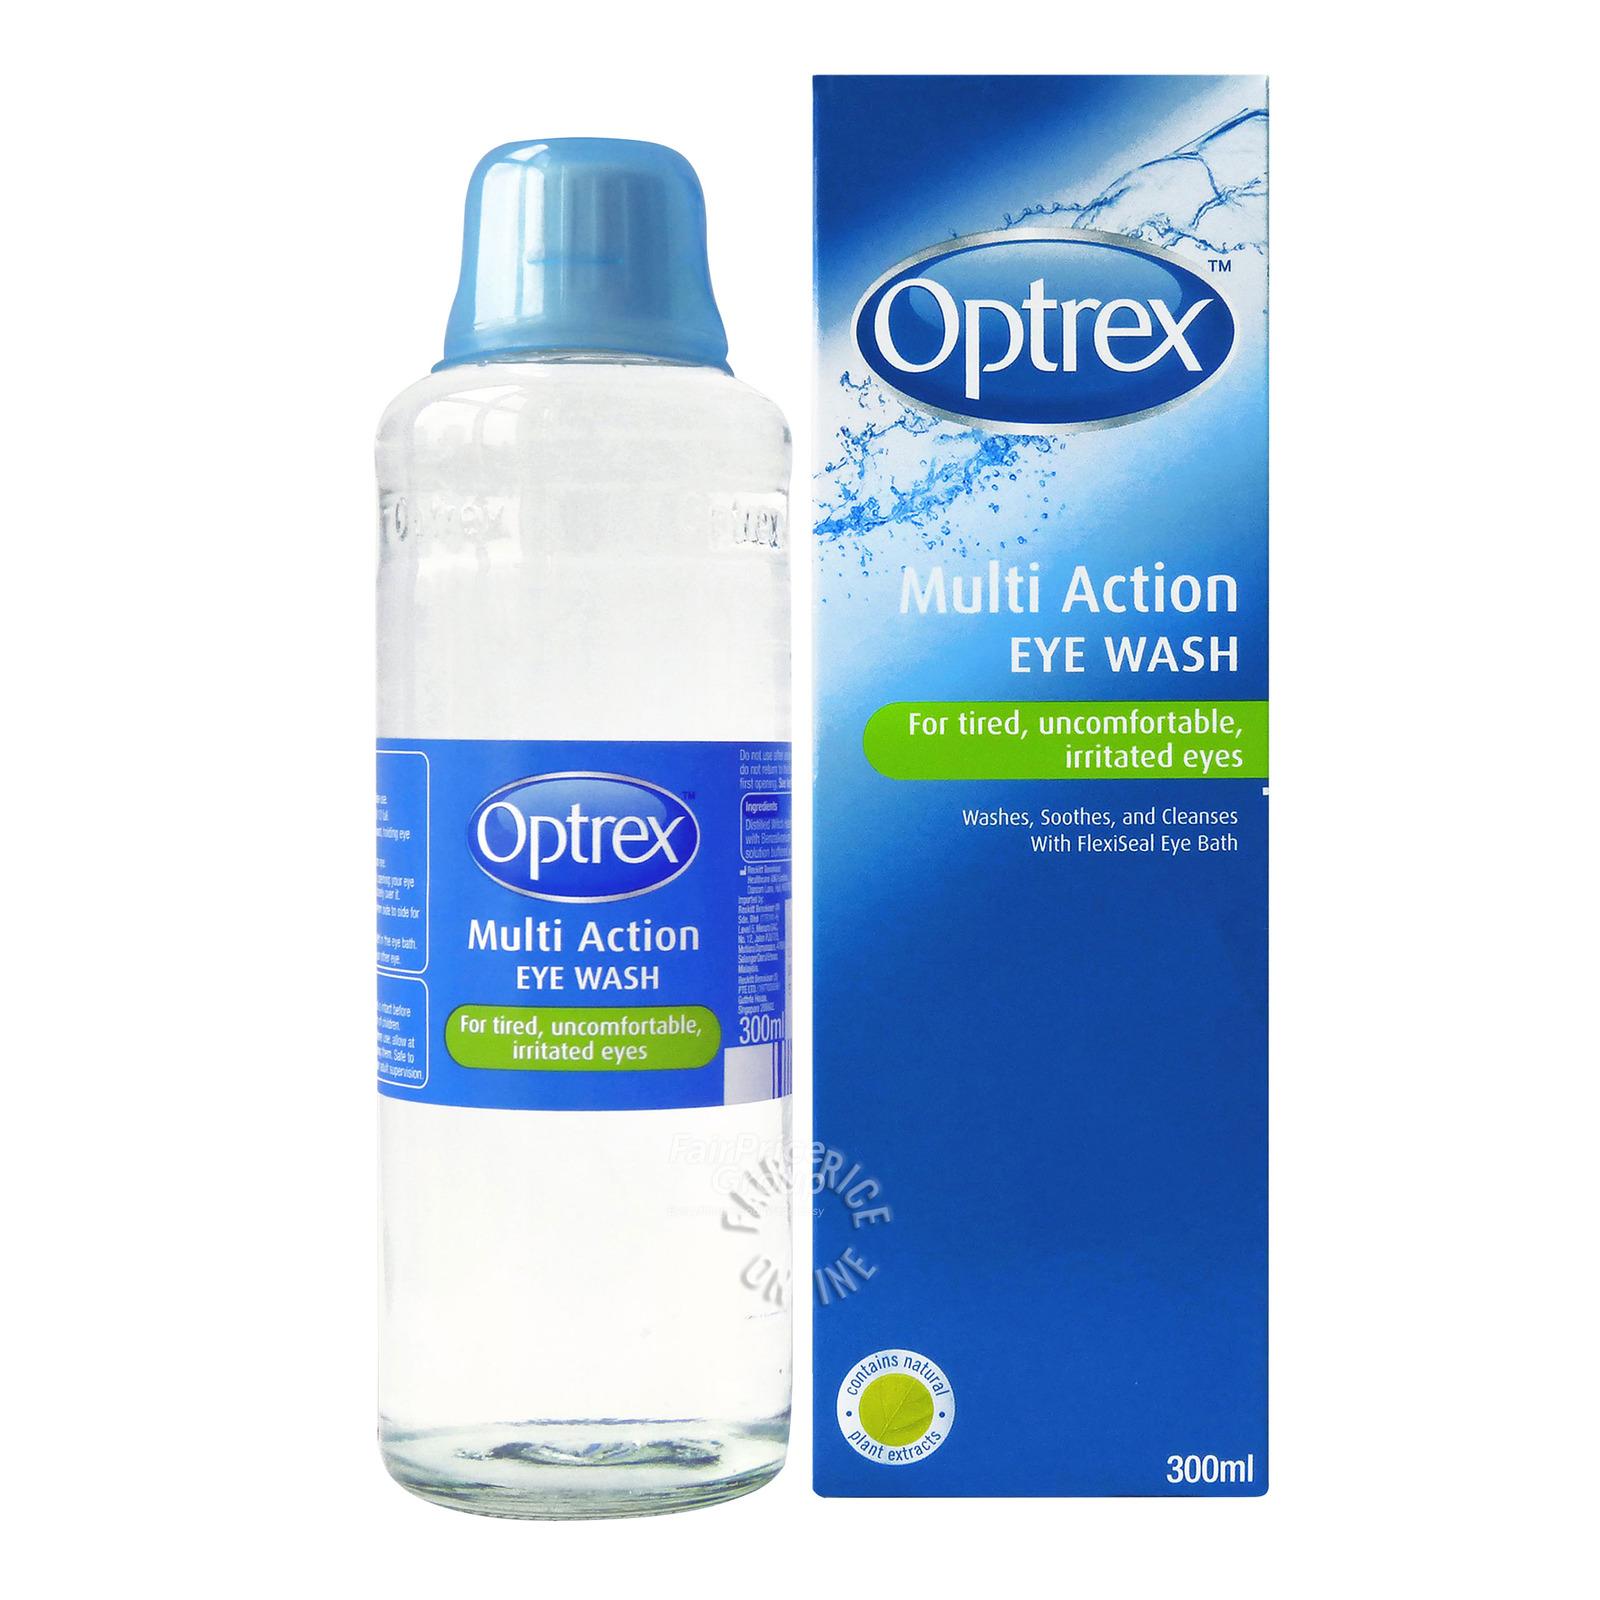 Optrex Eye Lotion with Eye Bath